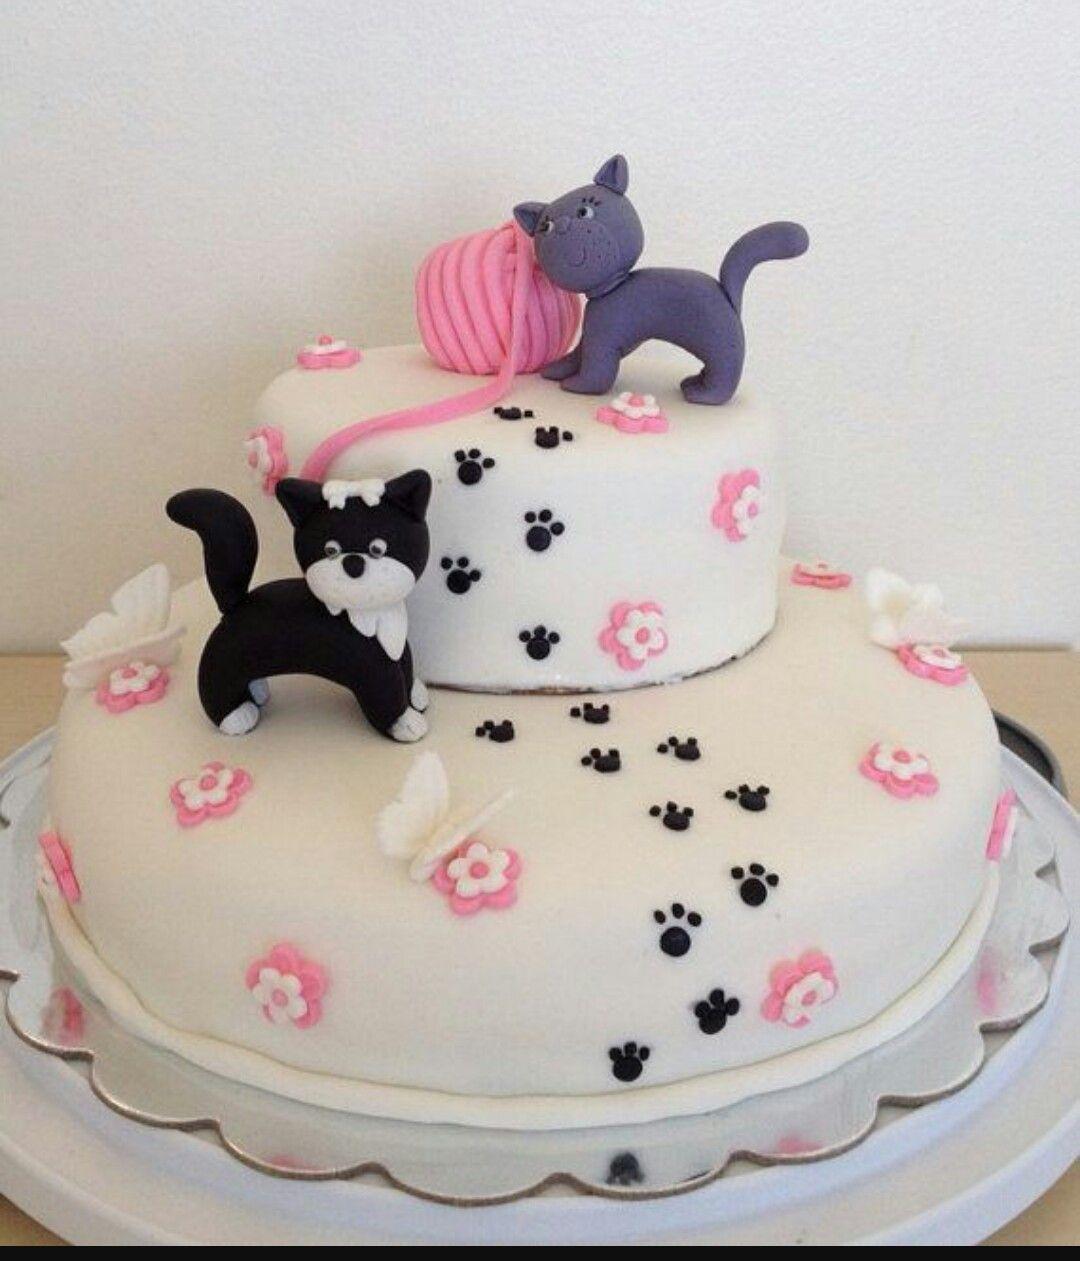 Pin de Cindi Switzer en Birthday | Pinterest | Tortilla, Pastelitos ...